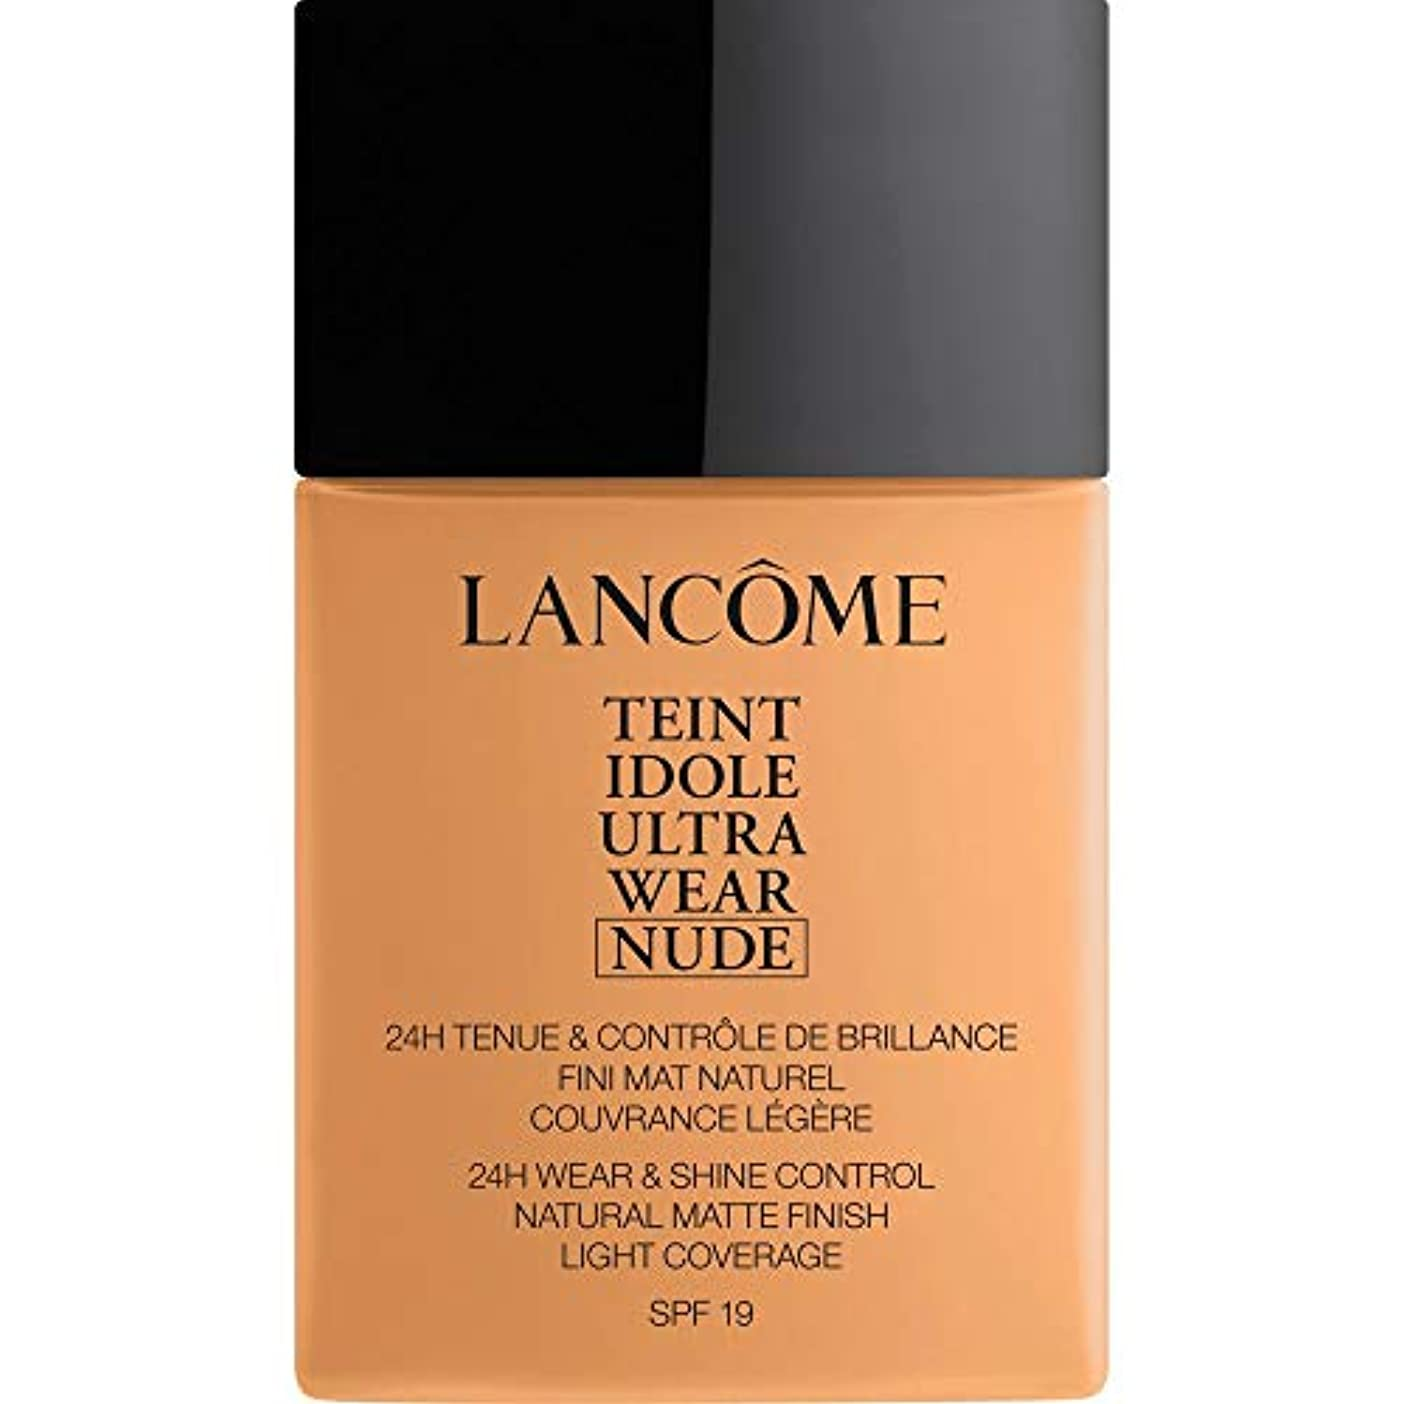 [Lanc?me ] ランコムTeintのIdole超摩耗ヌード財団Spf19の40ミリリットル051 - Chataigne - Lancome Teint Idole Ultra Wear Nude Foundation...